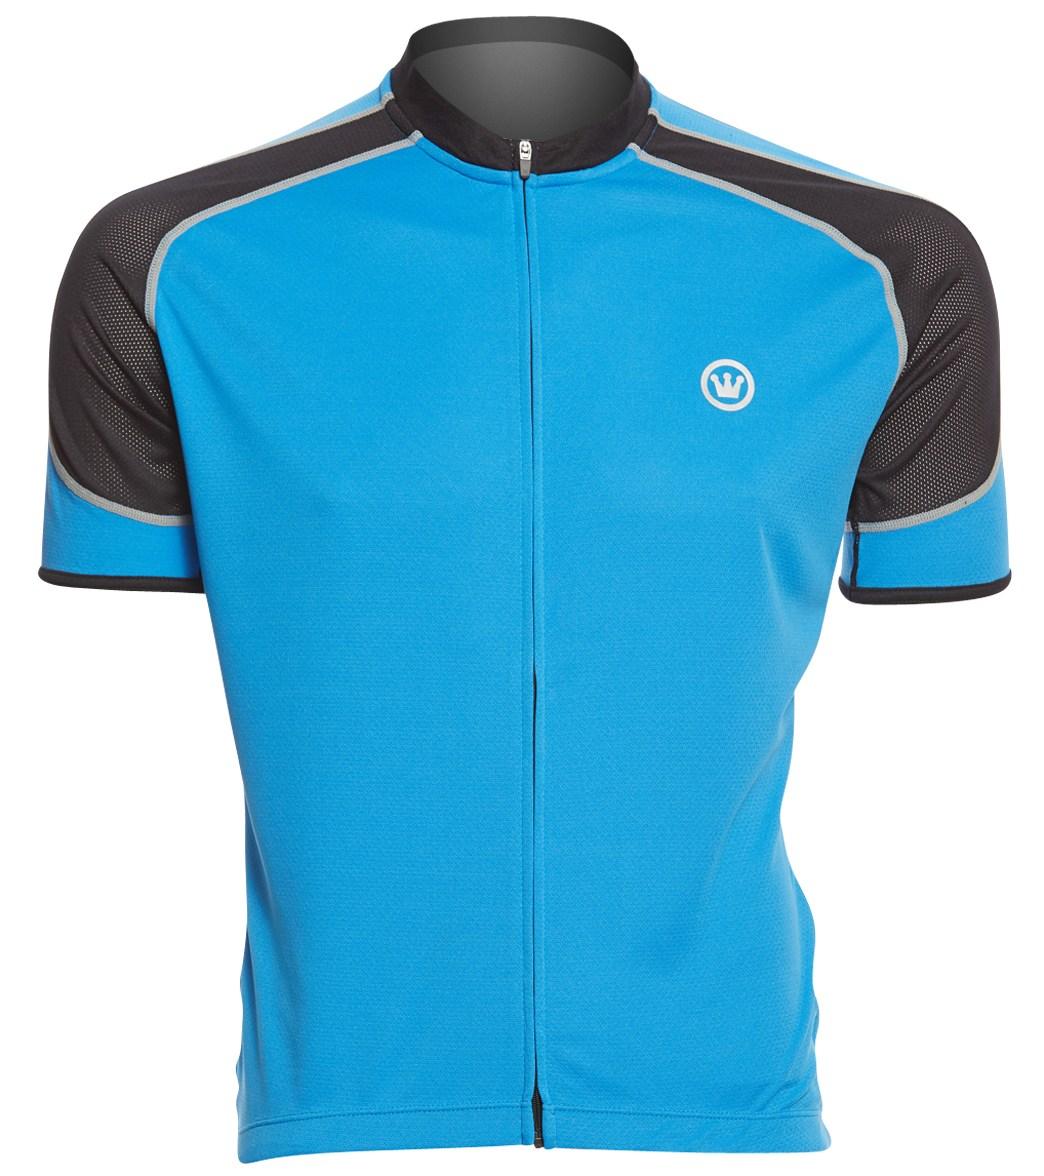 Canari Men s Streamline Short Sleeve Cycling Jersey at SwimOutlet.com 0c7d2514f